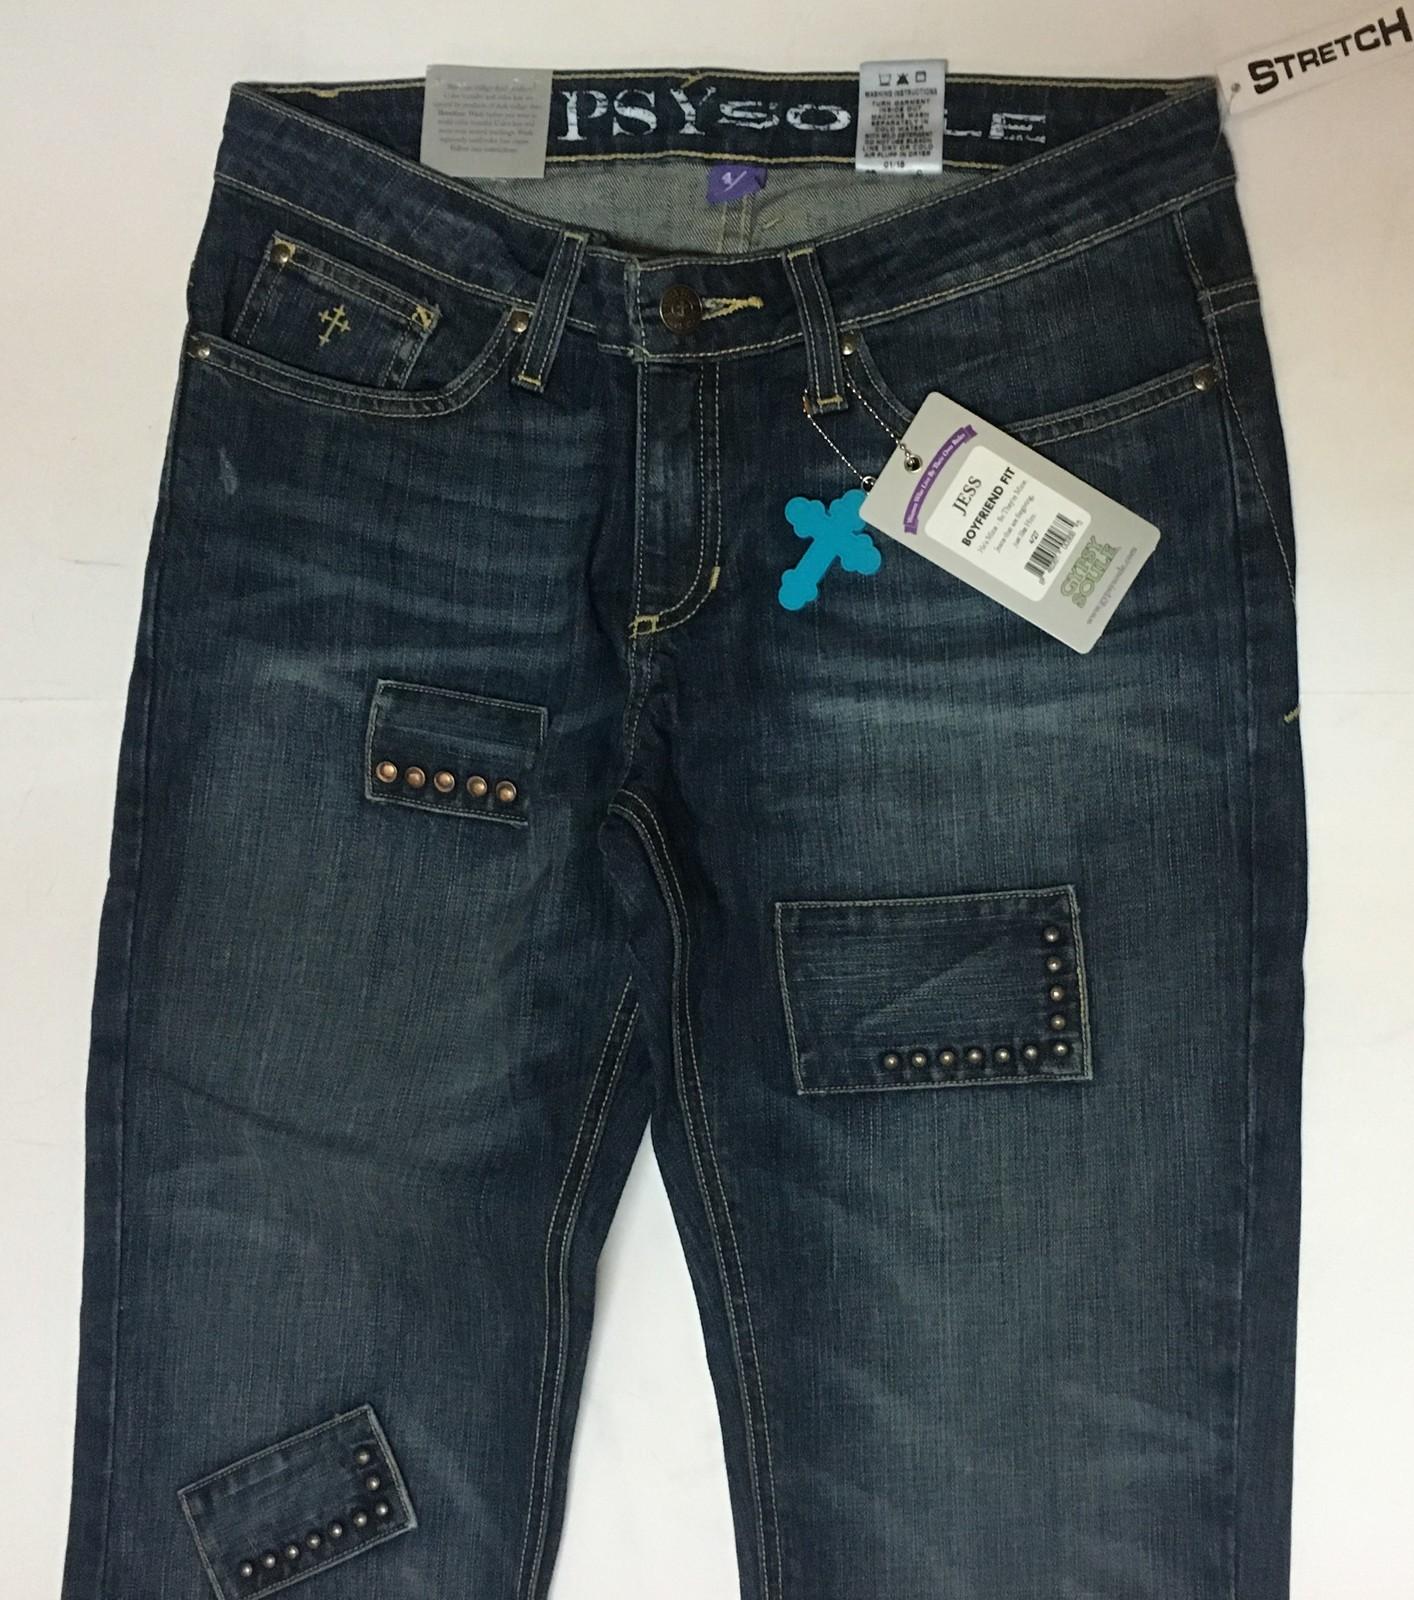 Women's Gypsy Soule Boyfriend Blue Jeans Jess Stretch Sz 28, 30, 34 Waist image 2